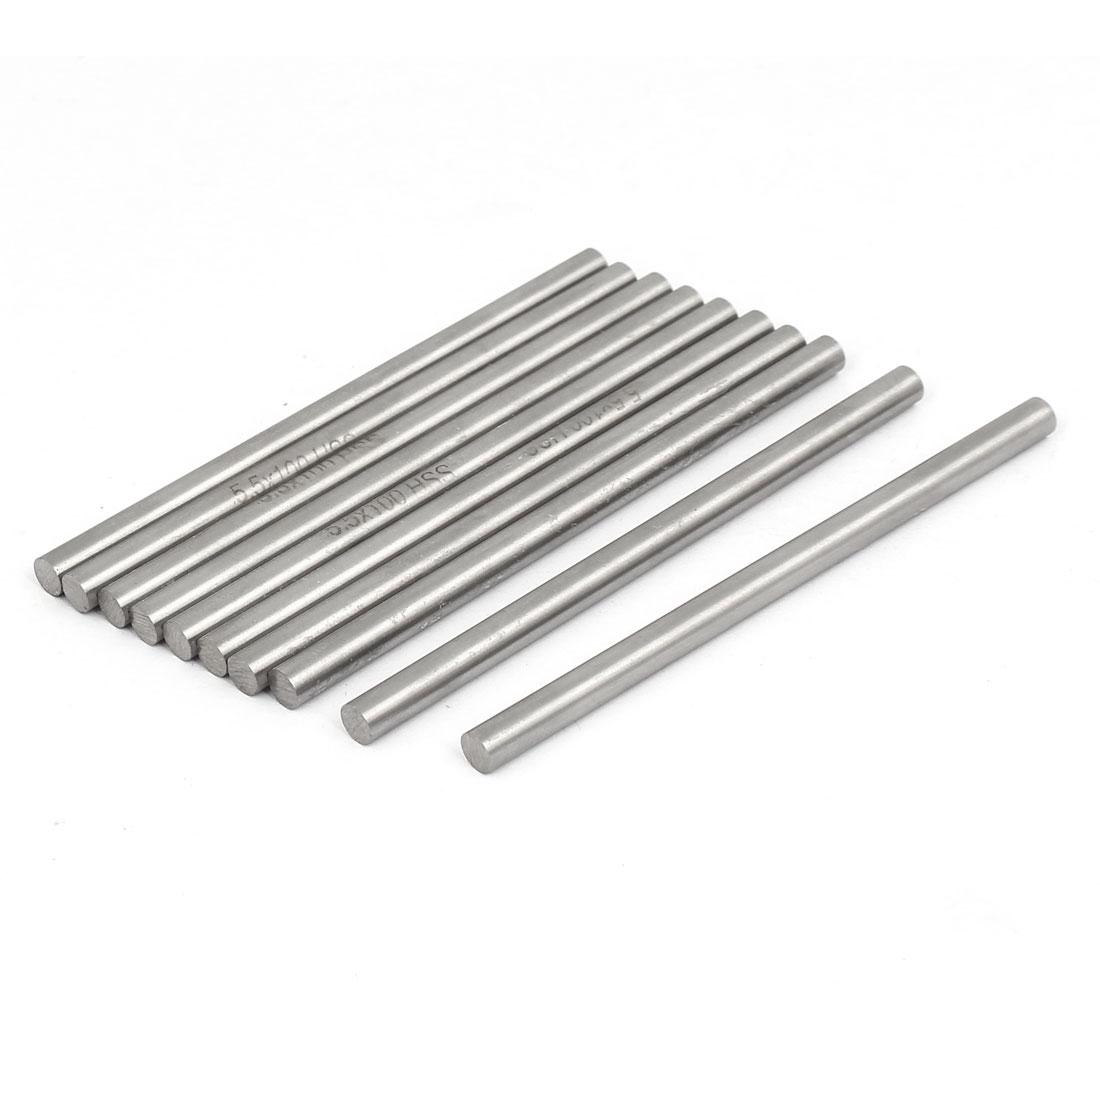 5.5mm Dia 100mm Length HSS Round Shaft Rod Bar Lathe Tools Gray 10pcs